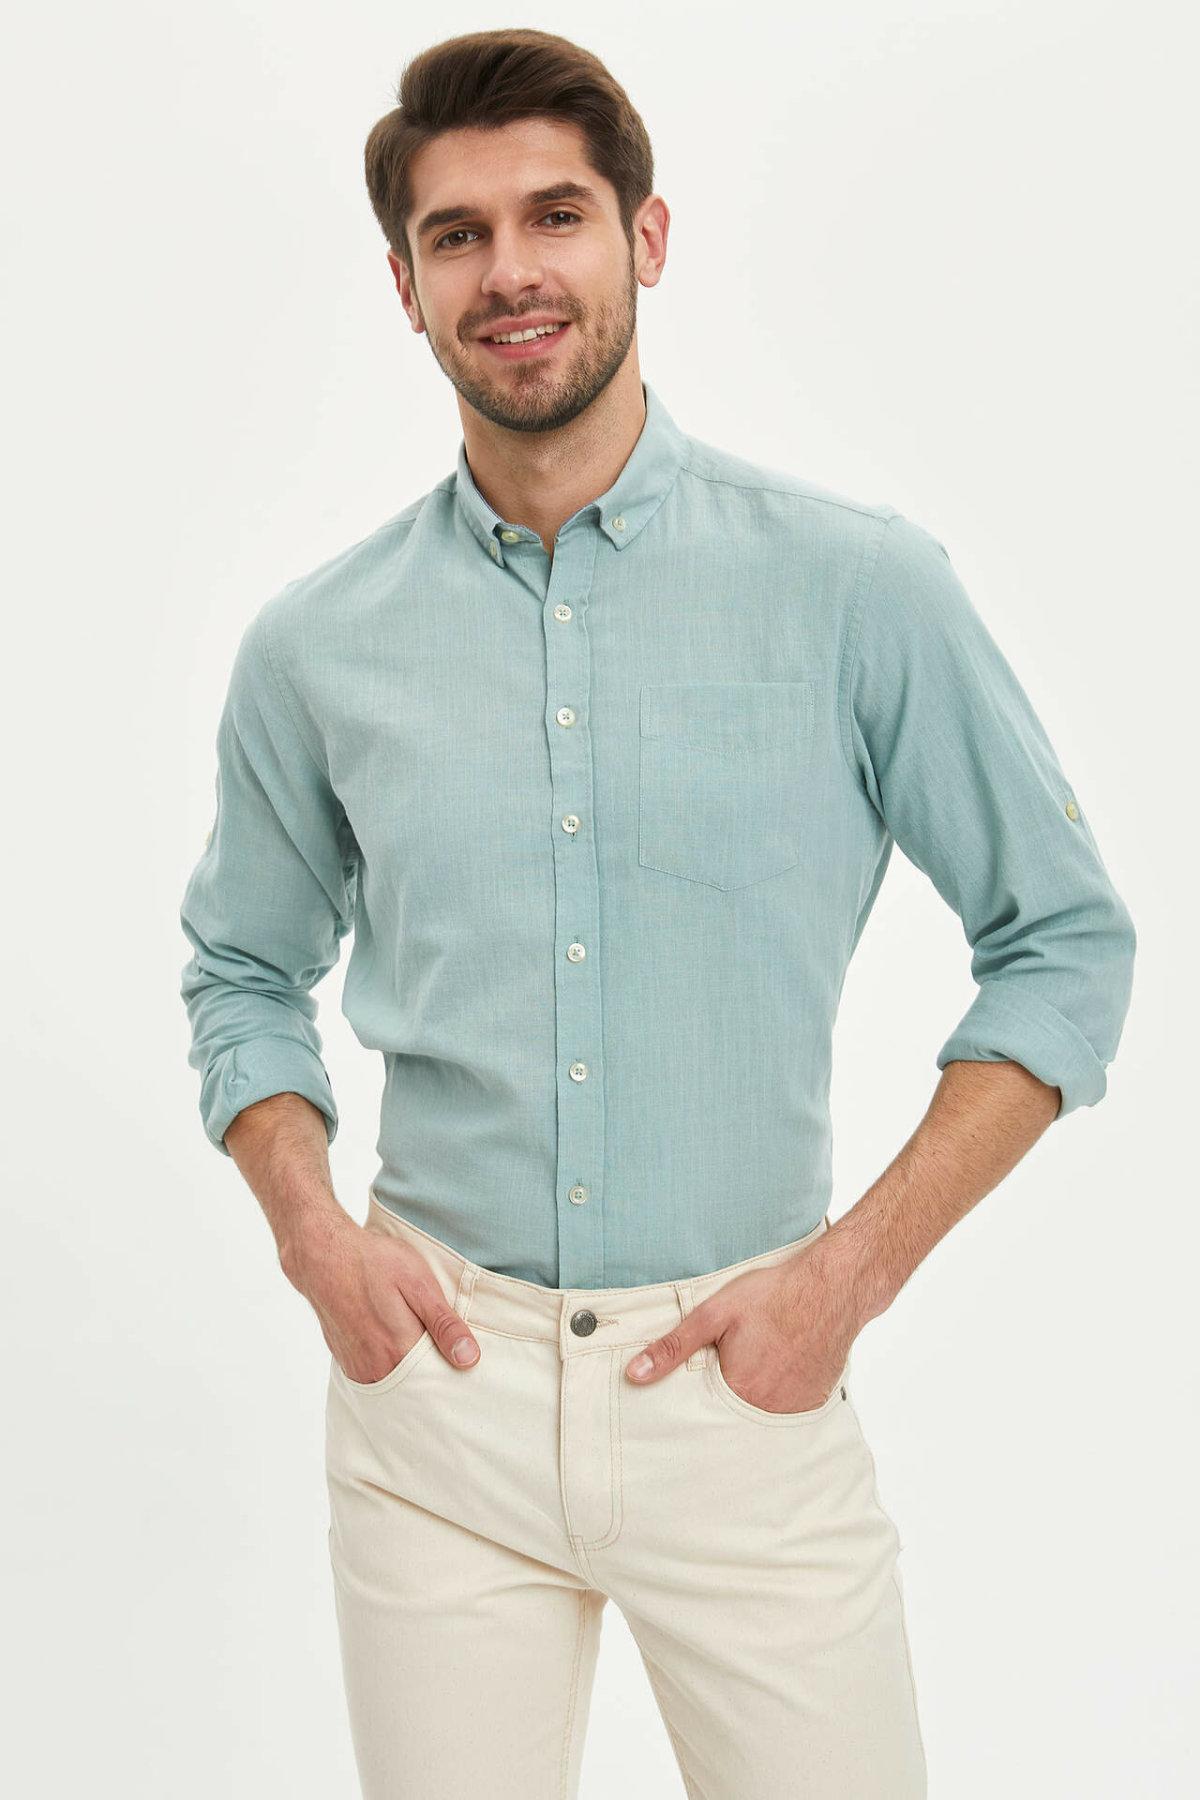 DeFacto Man Long Sleeve Shirt Men's Smart Casual Shirts Men's Basic Color Shirts Men's Spring White Shirts-M7180AZ20SP